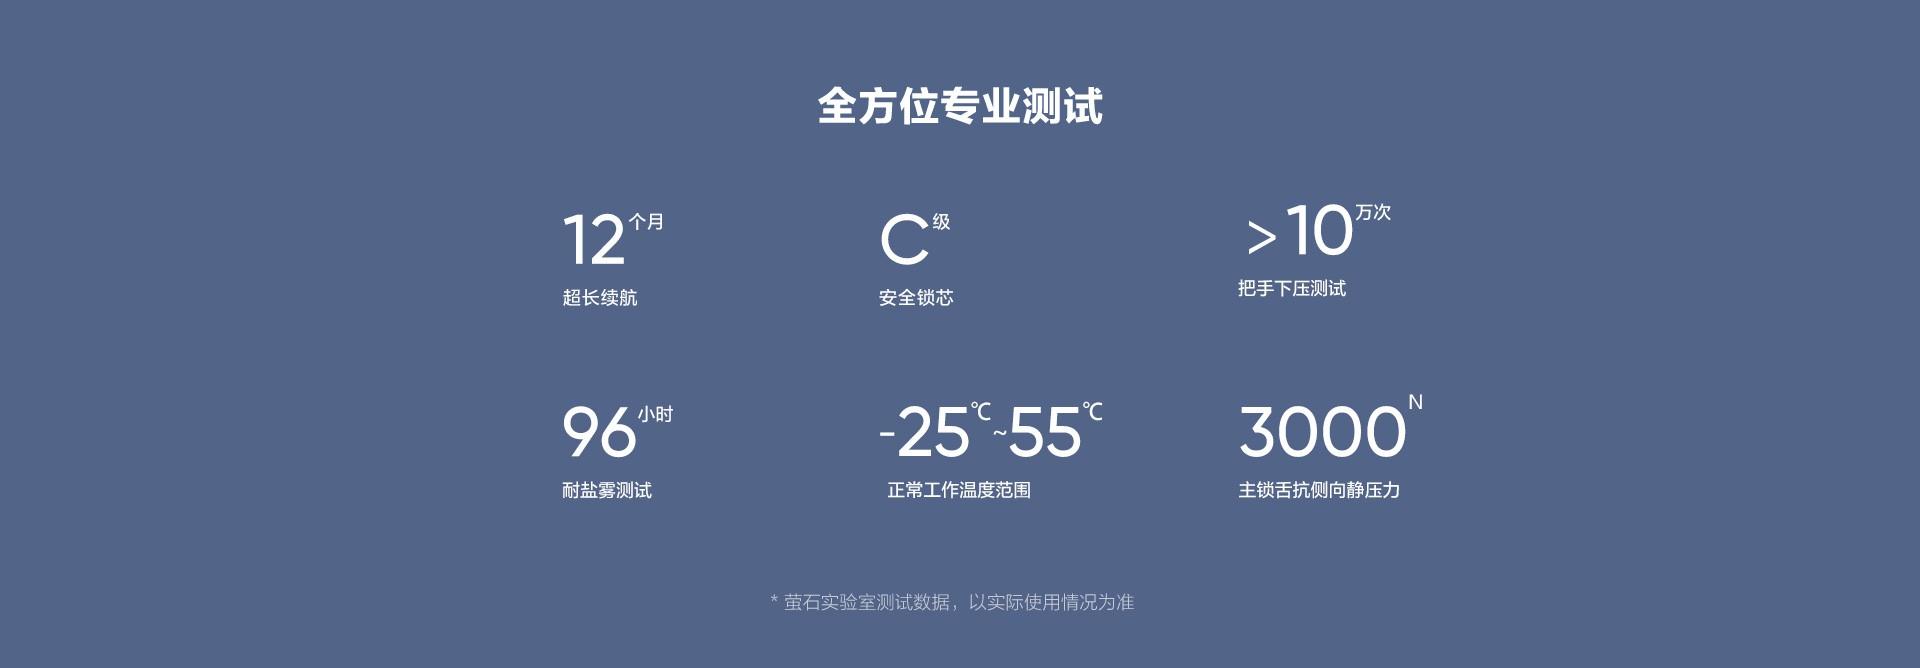 DL20S-WEB_14.jpg